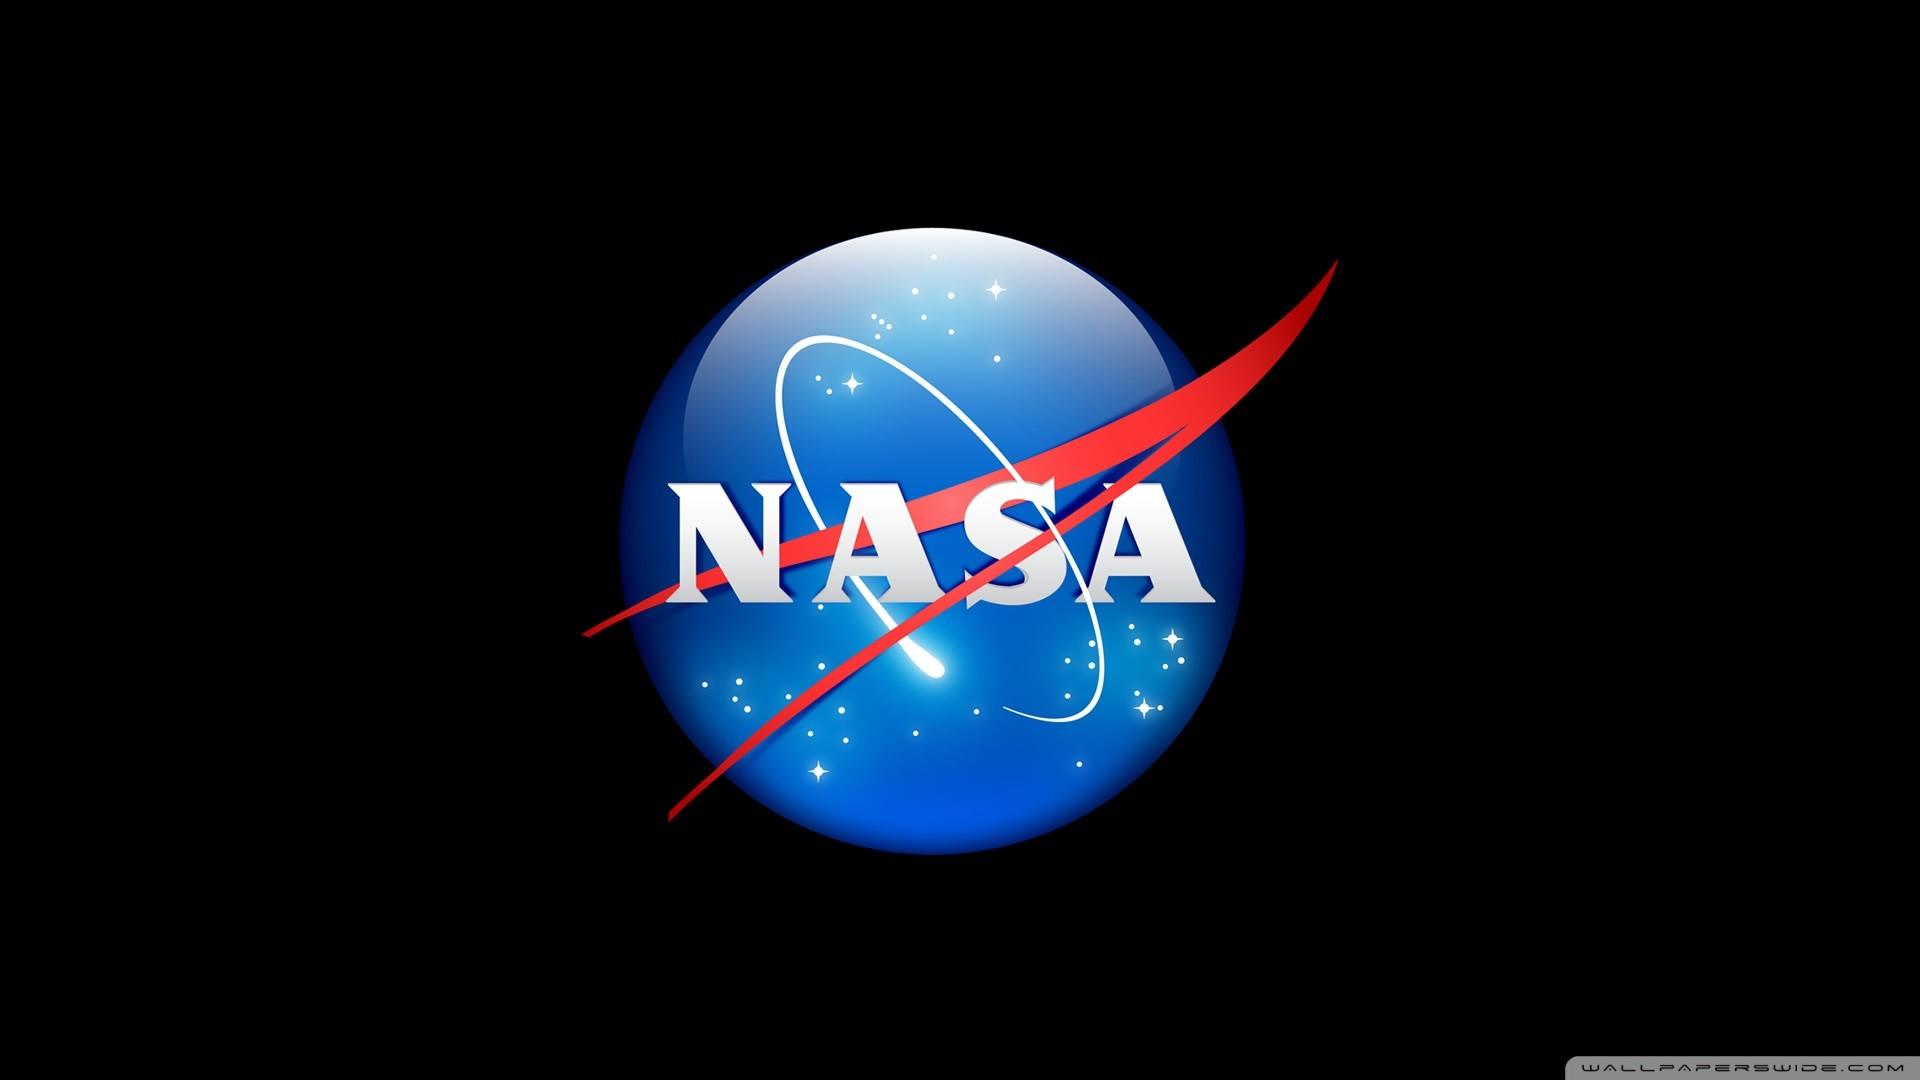 NASA HD Wide Wallpaper for Widescreen